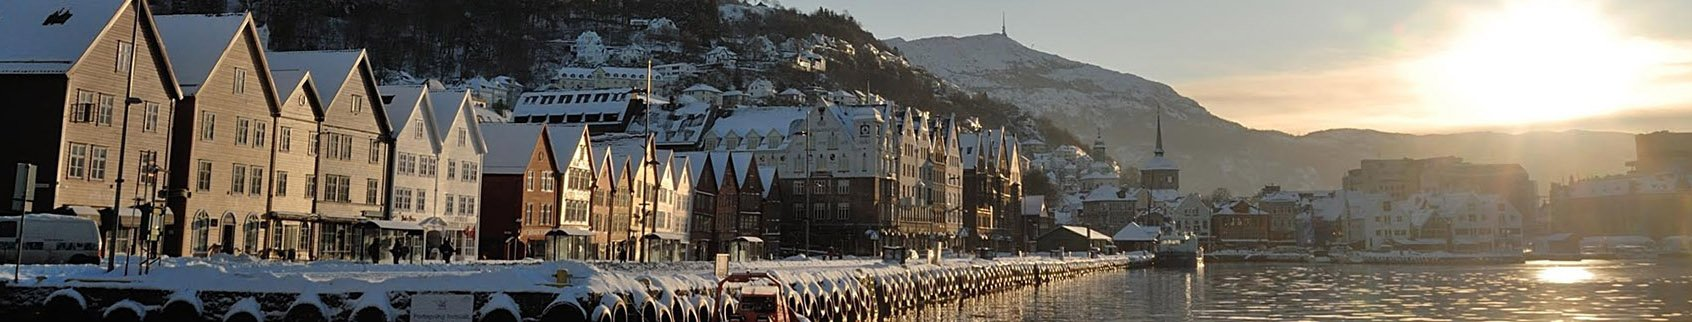 header-image tobergen.com